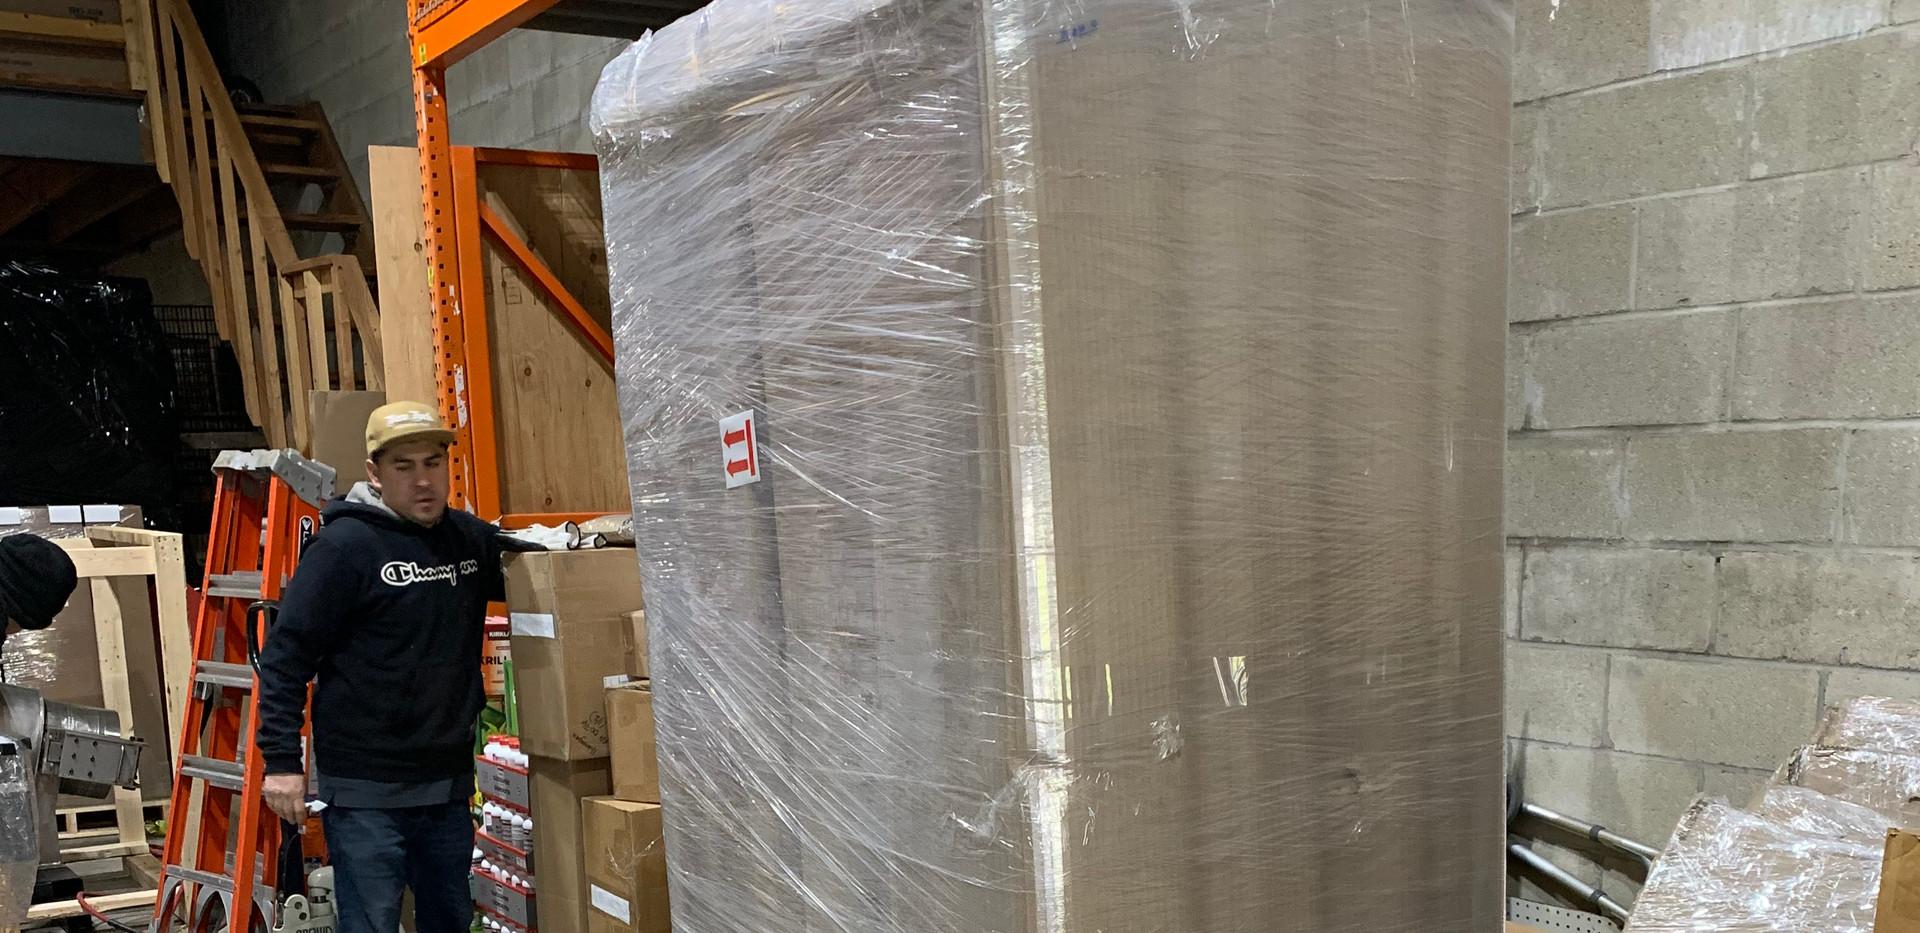 Corrugate, Shrink wrap, cornerning. We got it all covered